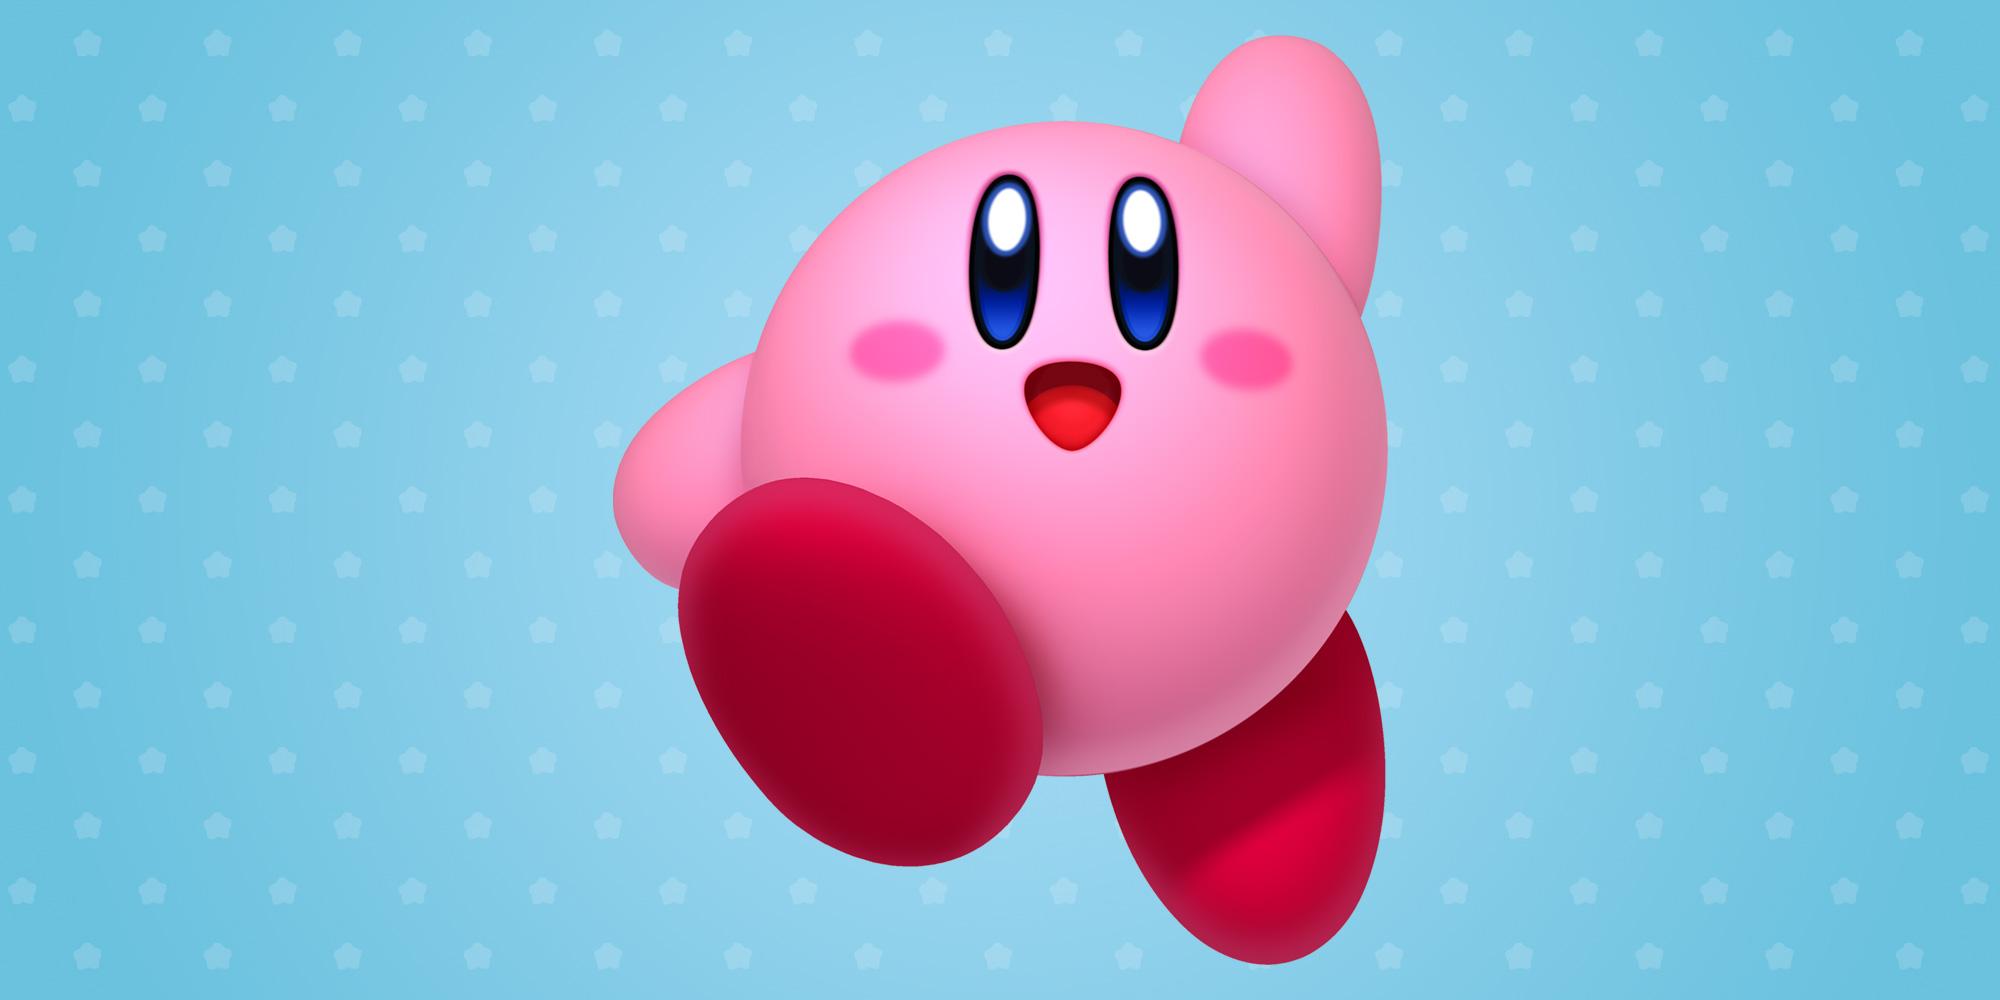 H2x1_KidsClub_ReadAndDiscover_KirbyFunFa